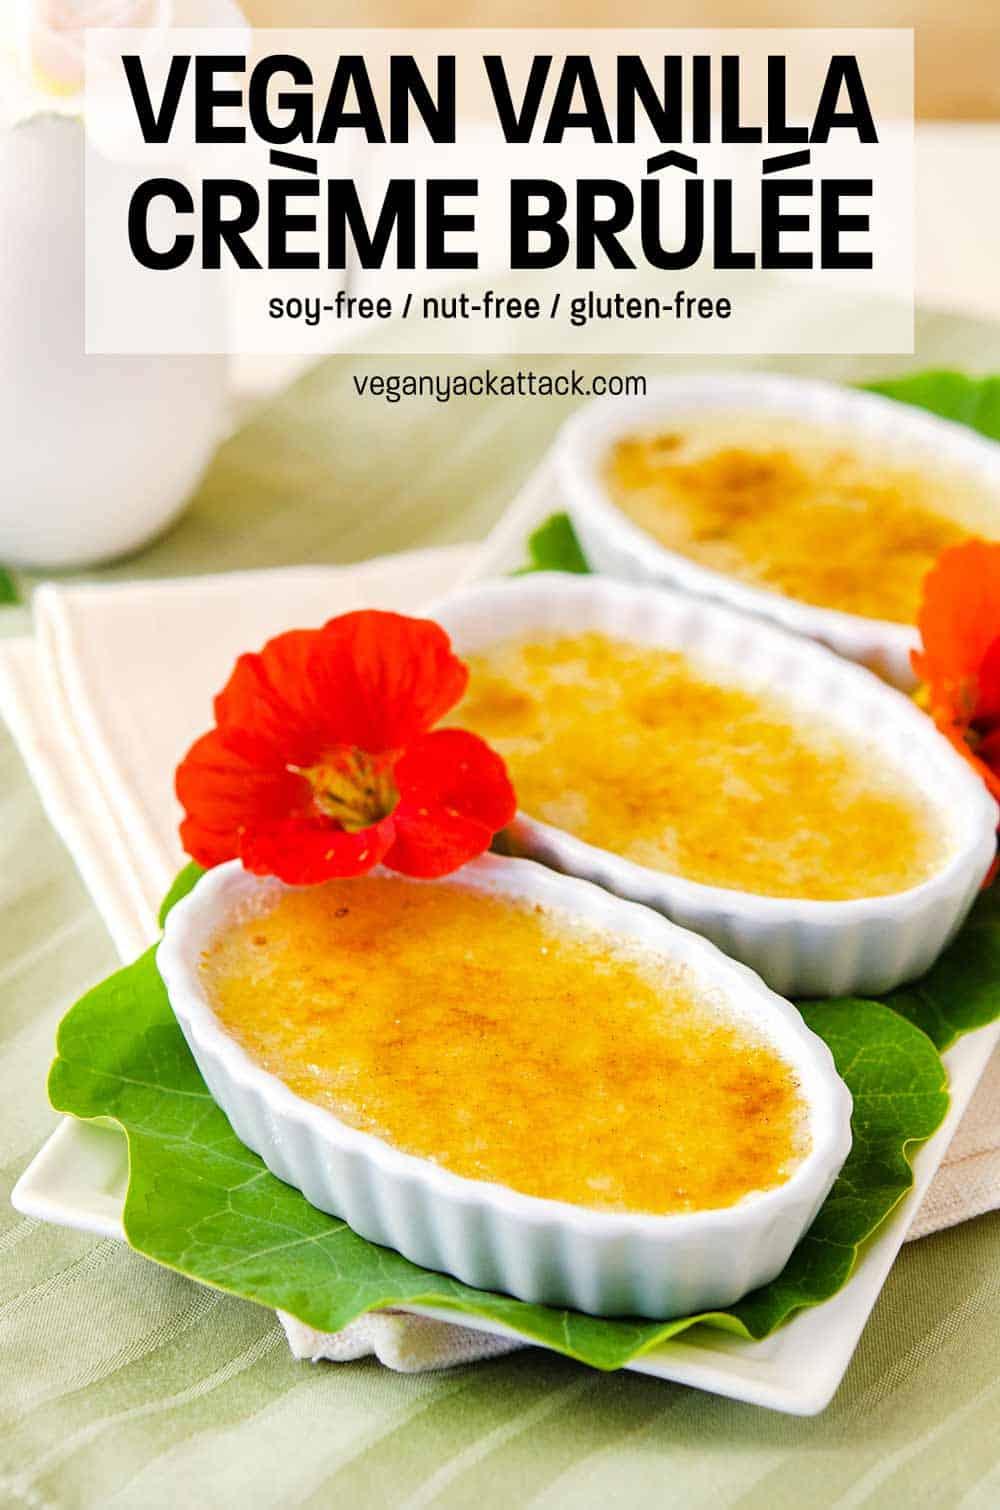 Three dishes of Vegan Vanilla Crème Brûlée on nasturtium leaves with flowers